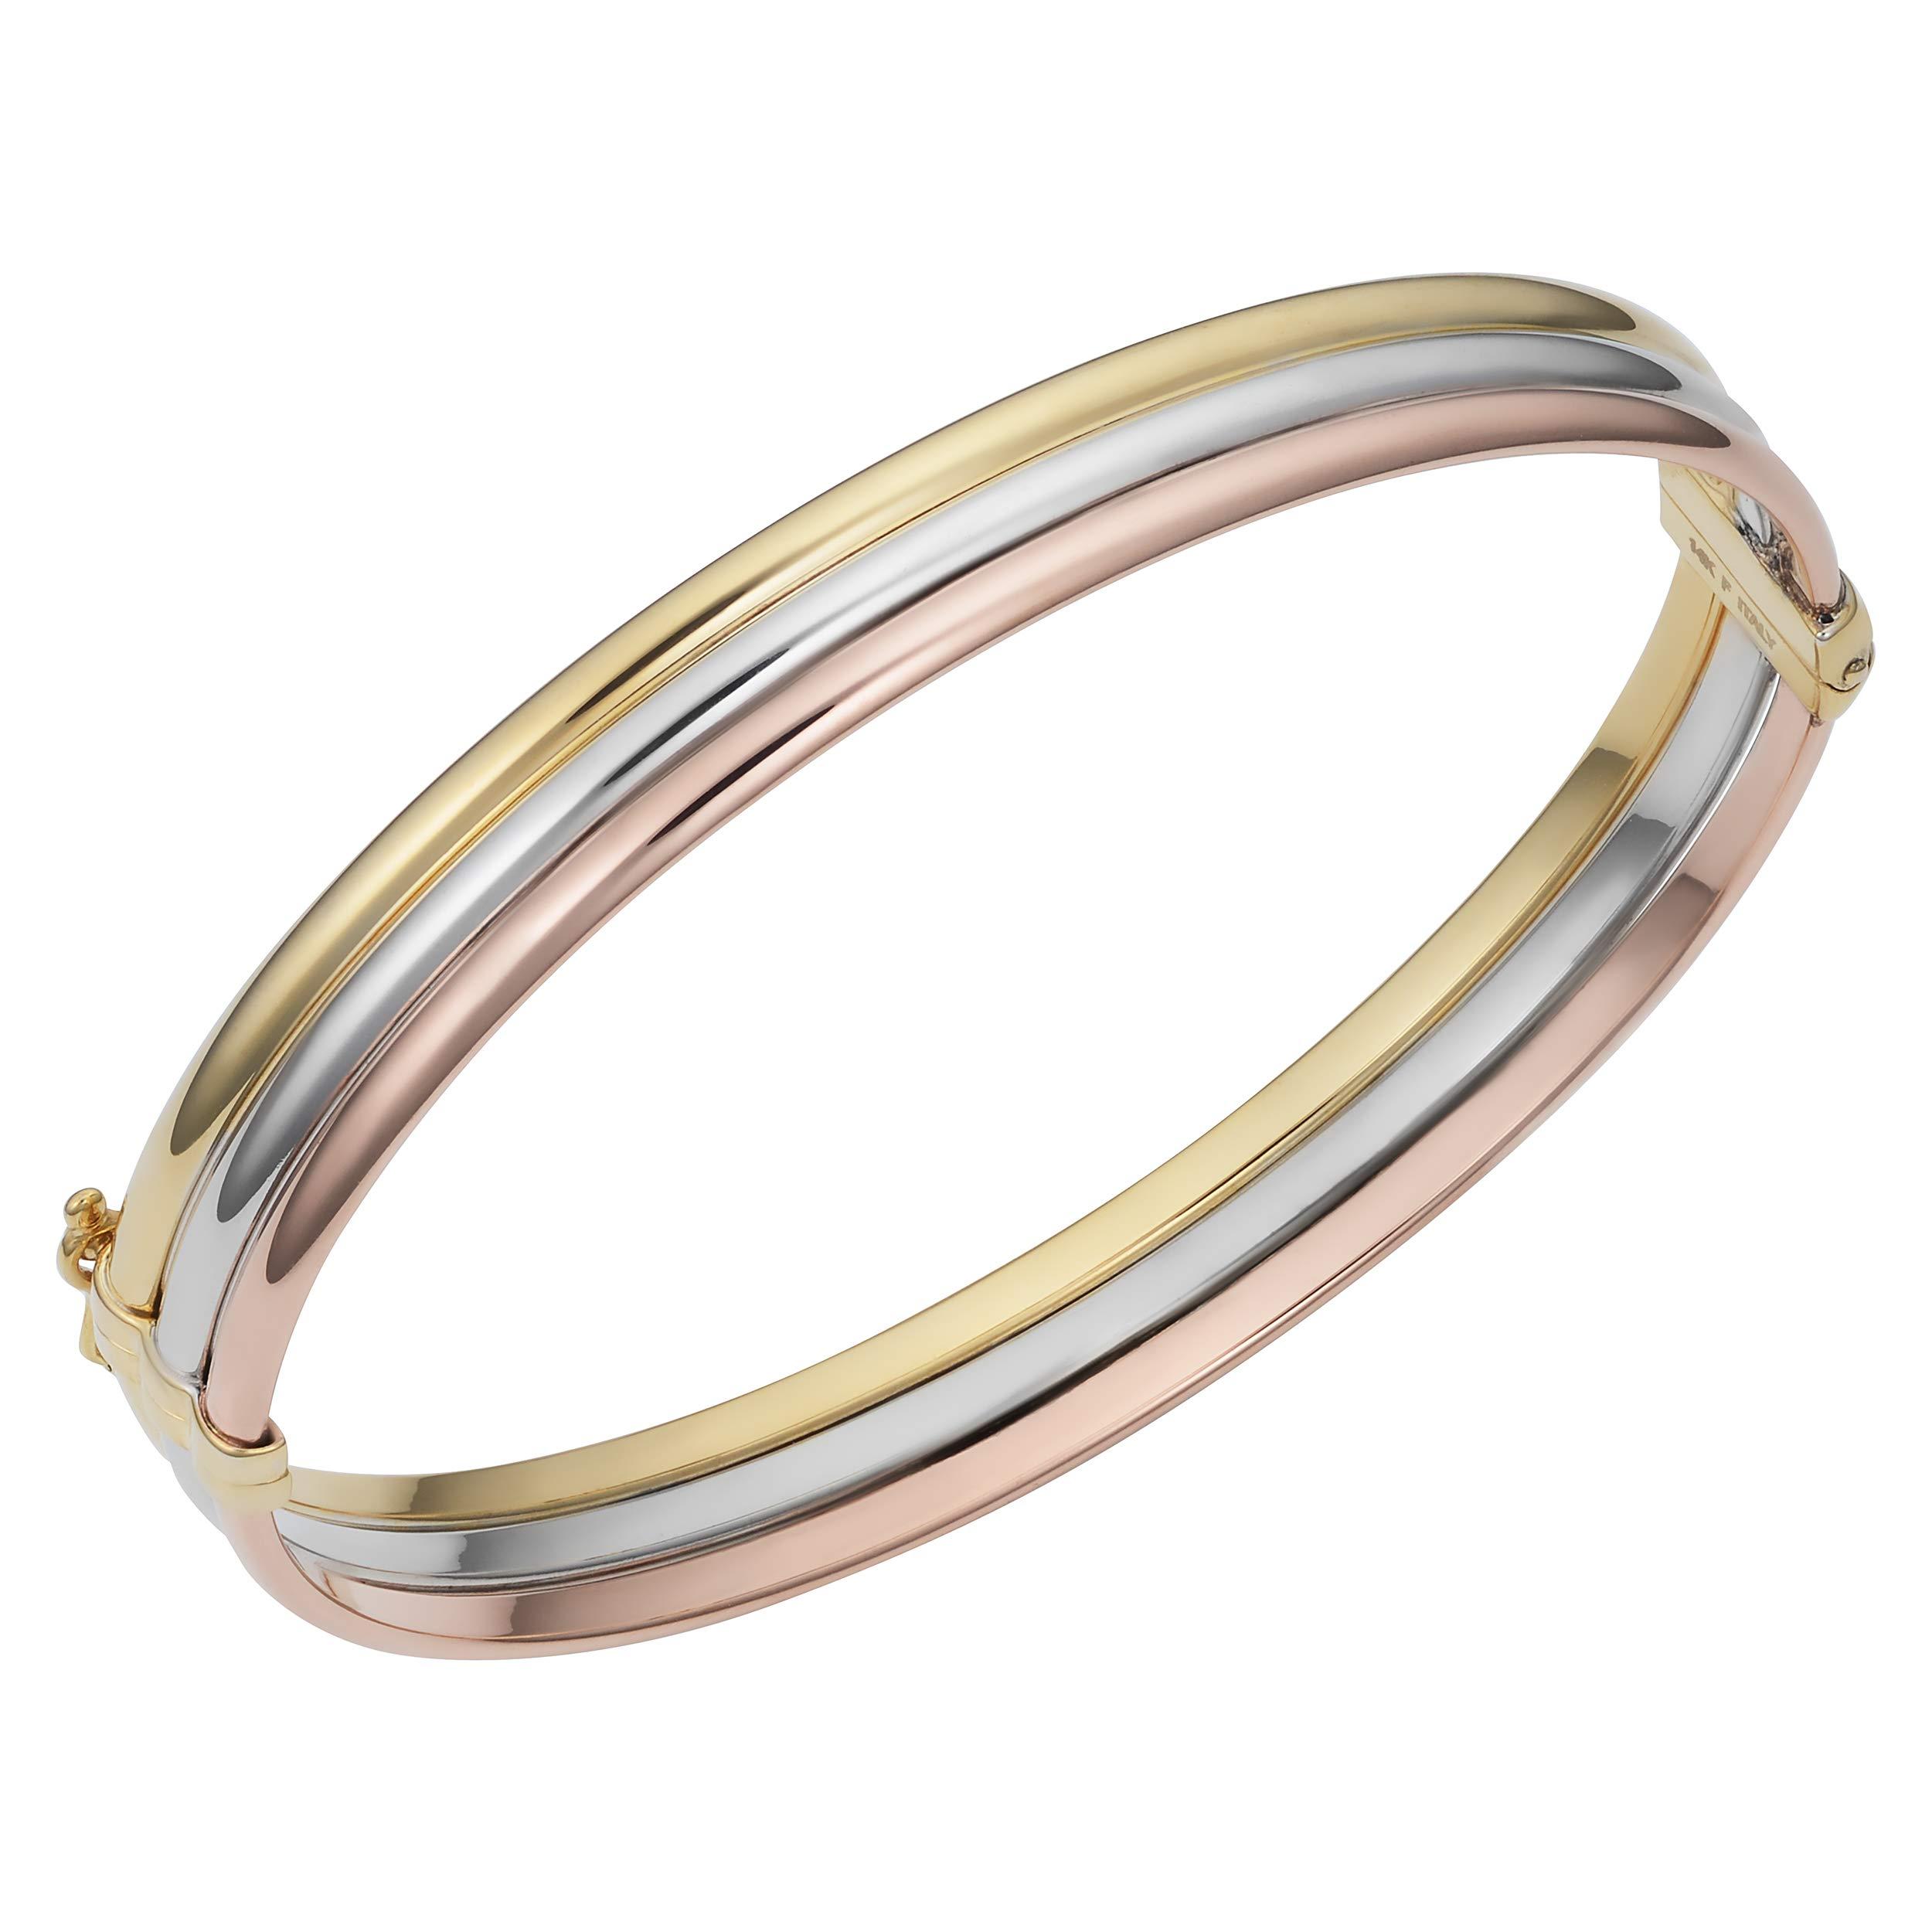 14k Gold Tricolor Triple Bangle Bracelet (7.5 inch)